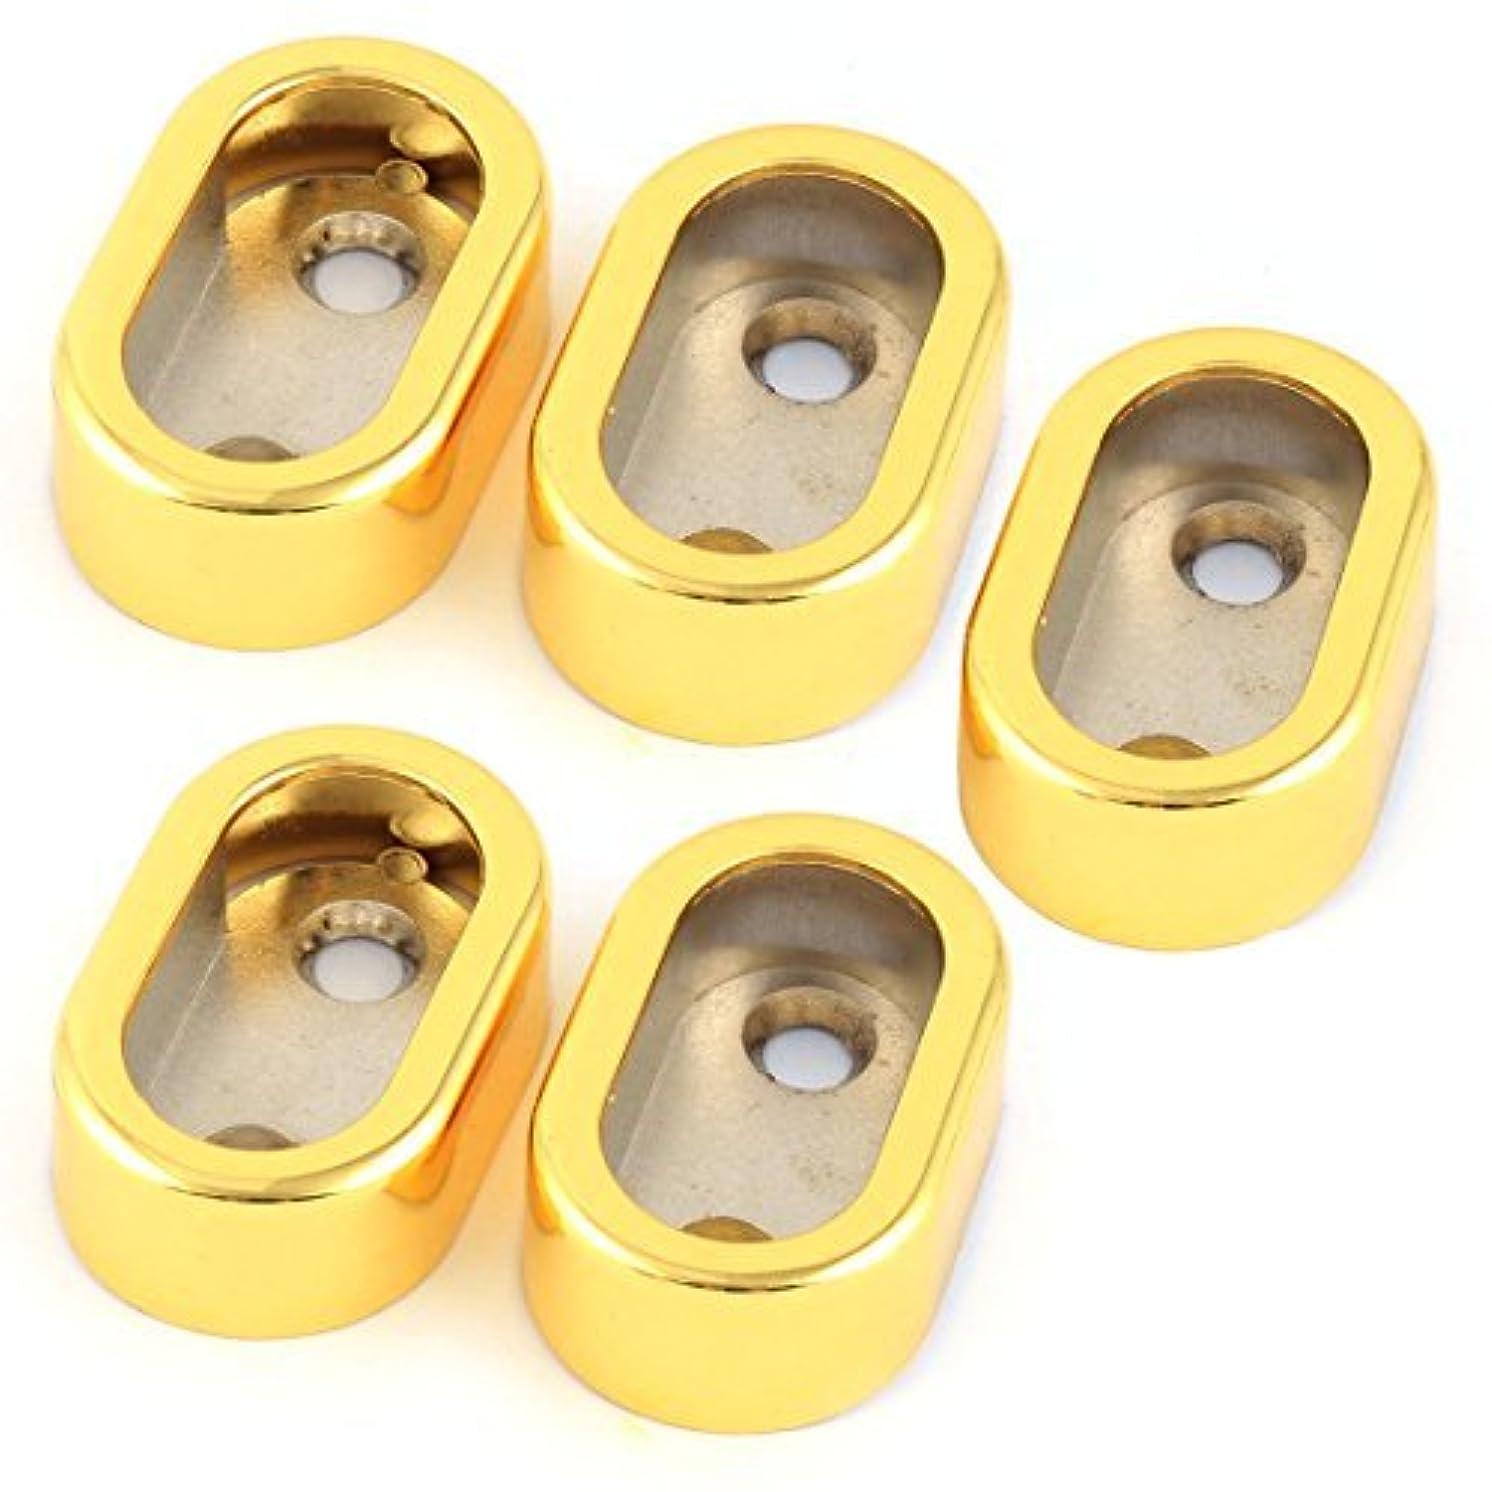 DealMux Metal Home Garment Clothes Closet Rod Holder End Support Socket Bracket 5pcs Gold Tone